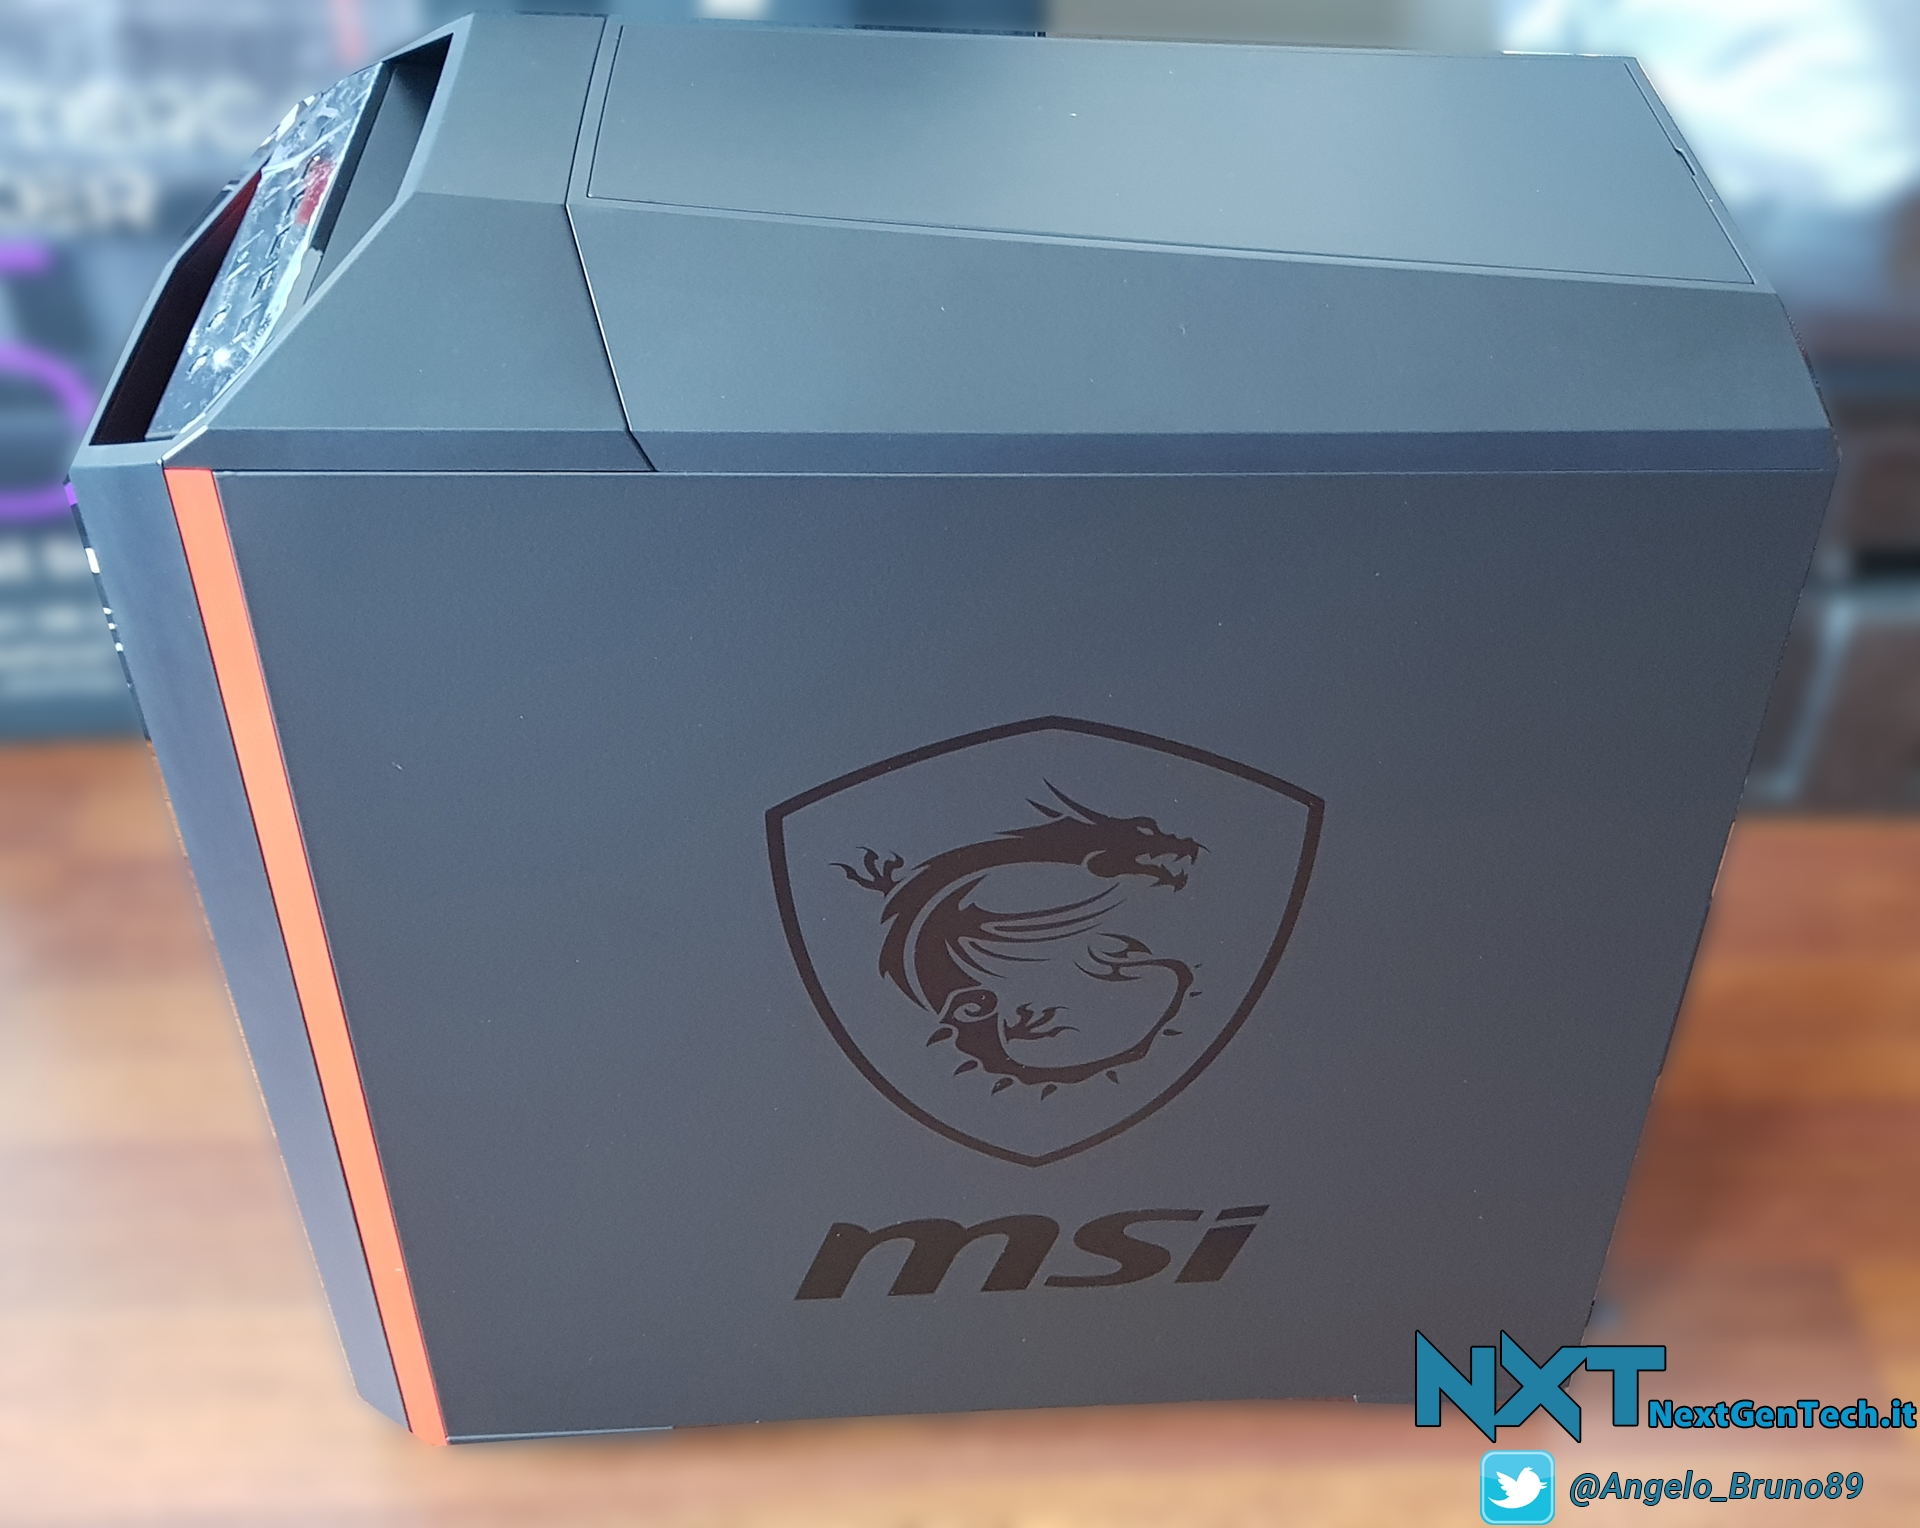 Mastercase M5 MSI DE (1_2)